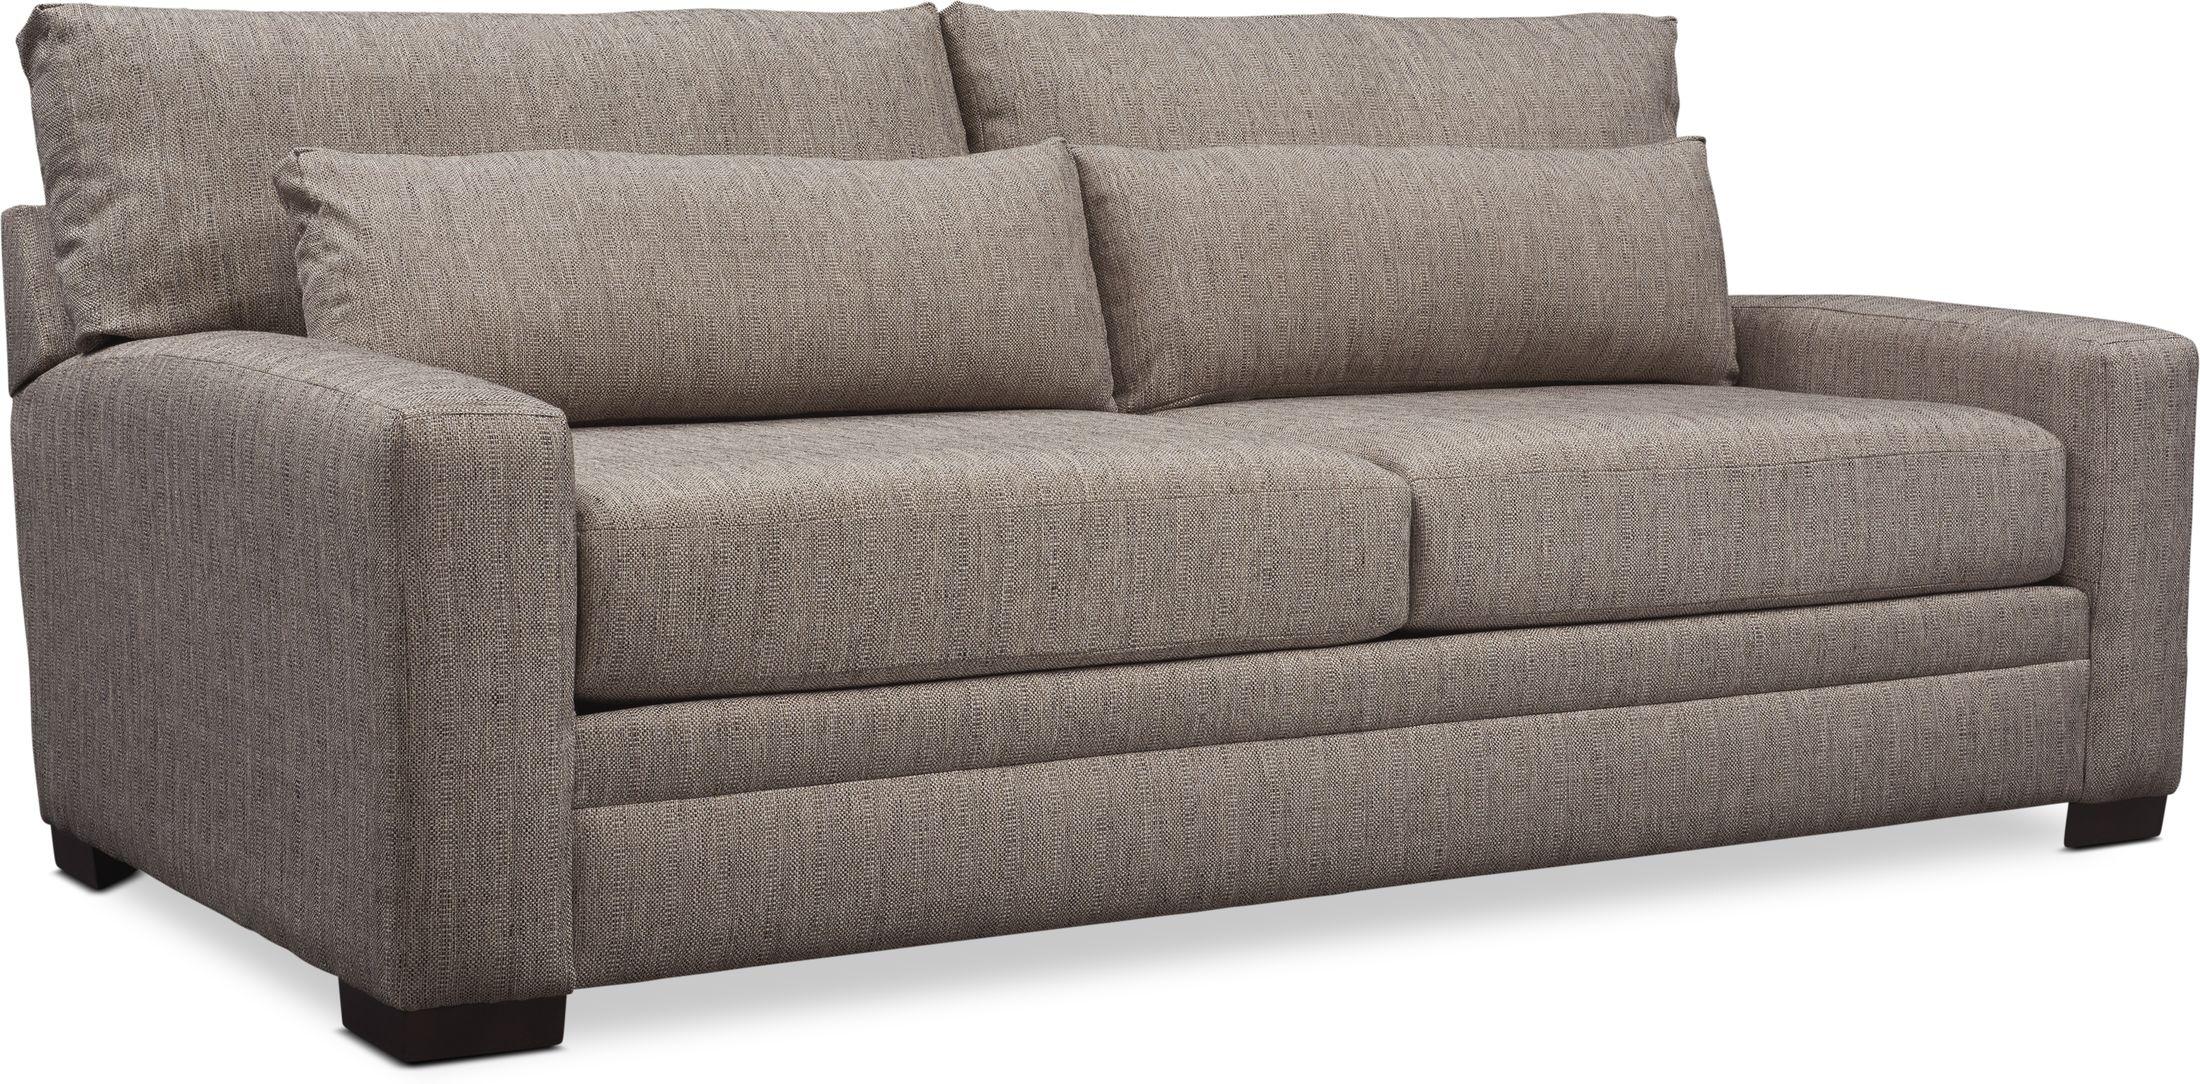 Living Room Furniture - Winston Sofa